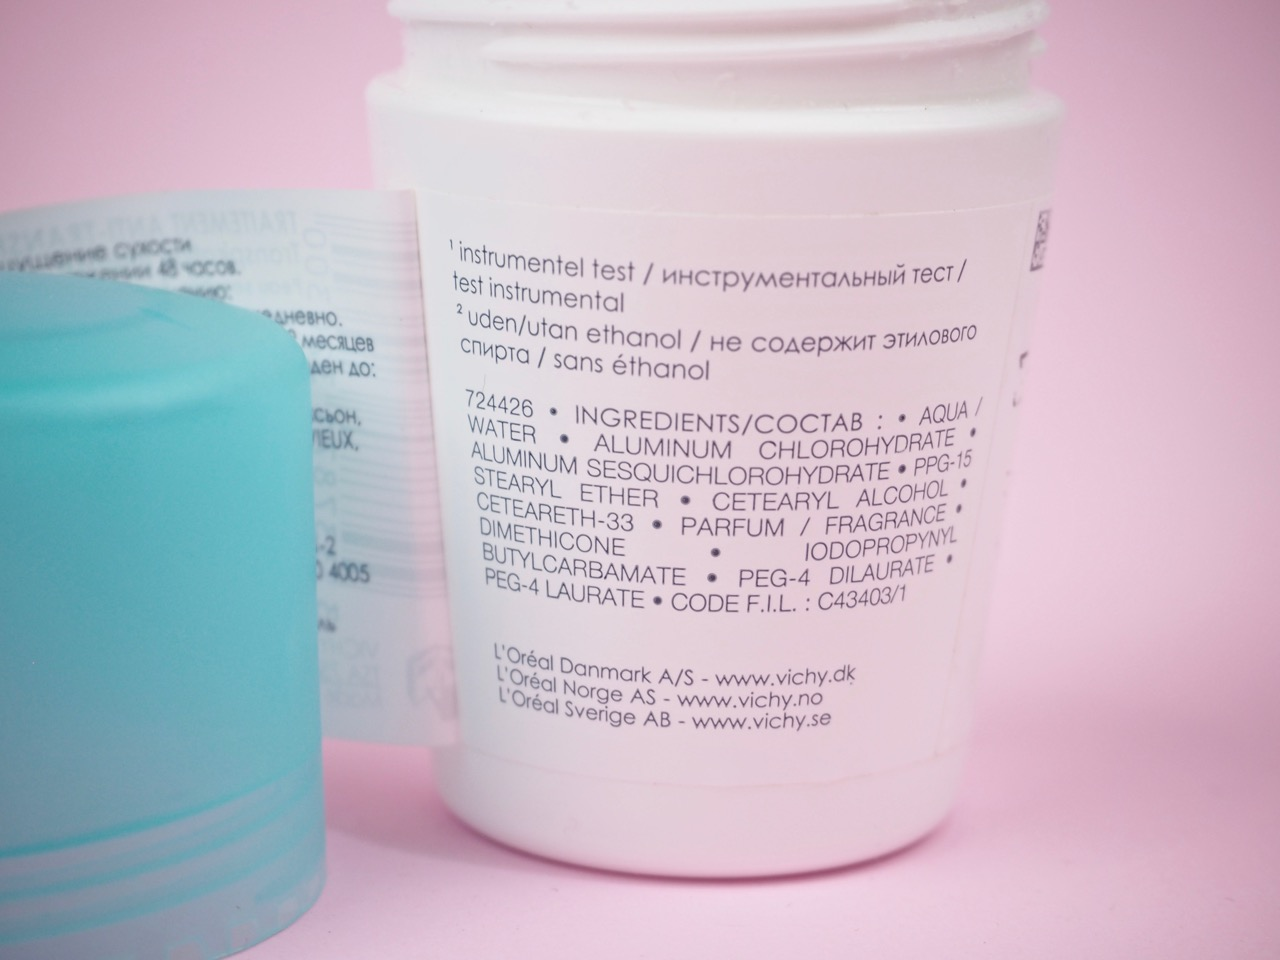 Vichy Antiperspirant Deodorant 48H antiperspirantti deodorantti kokemuksia Ostolakossa Virve Vee